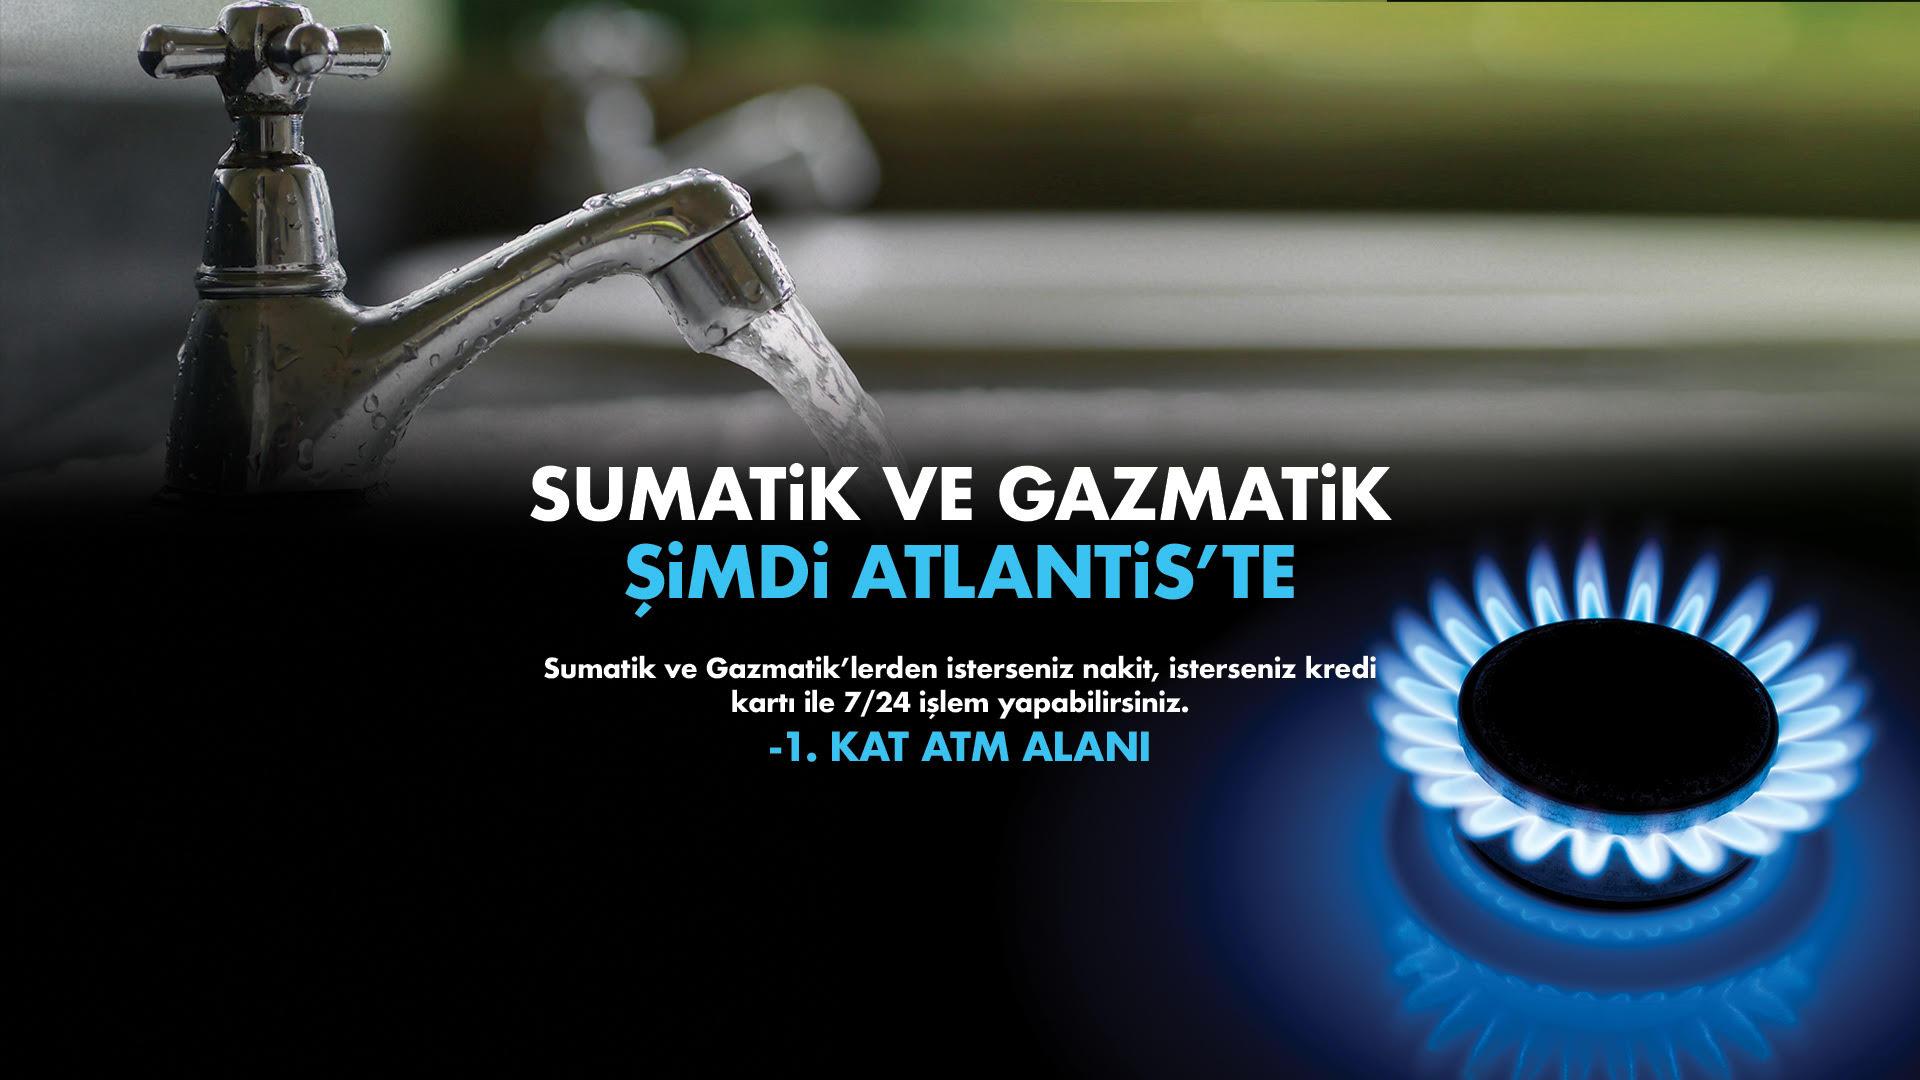 Su & Gaz Matik